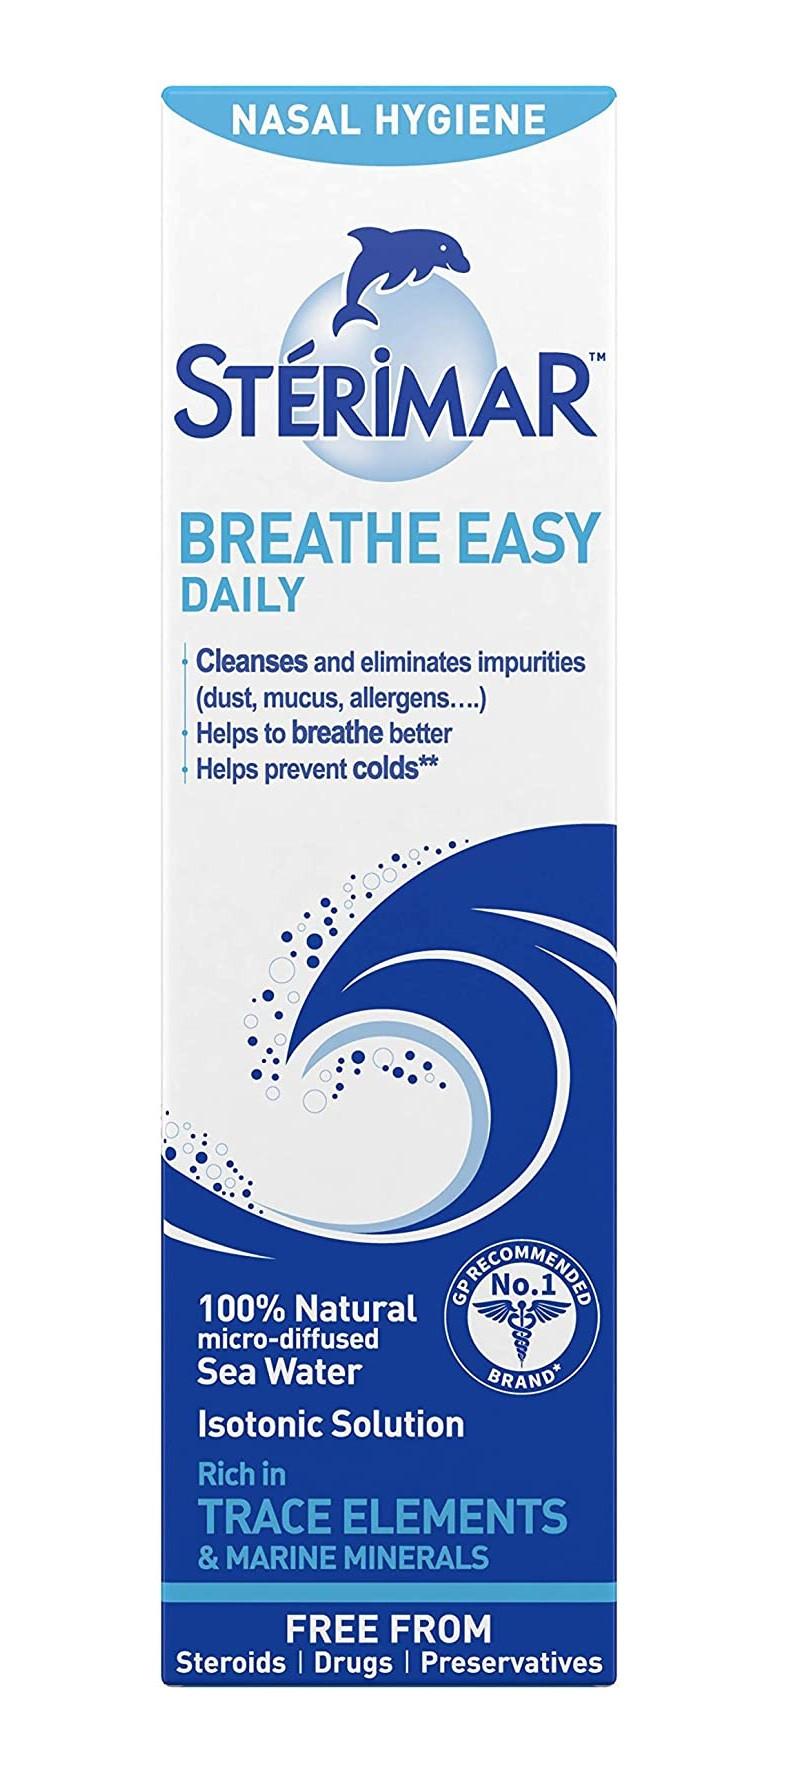 Sterimar Isotonic Nasal Hygiene Breathe Easy Nasal Spray 100ml